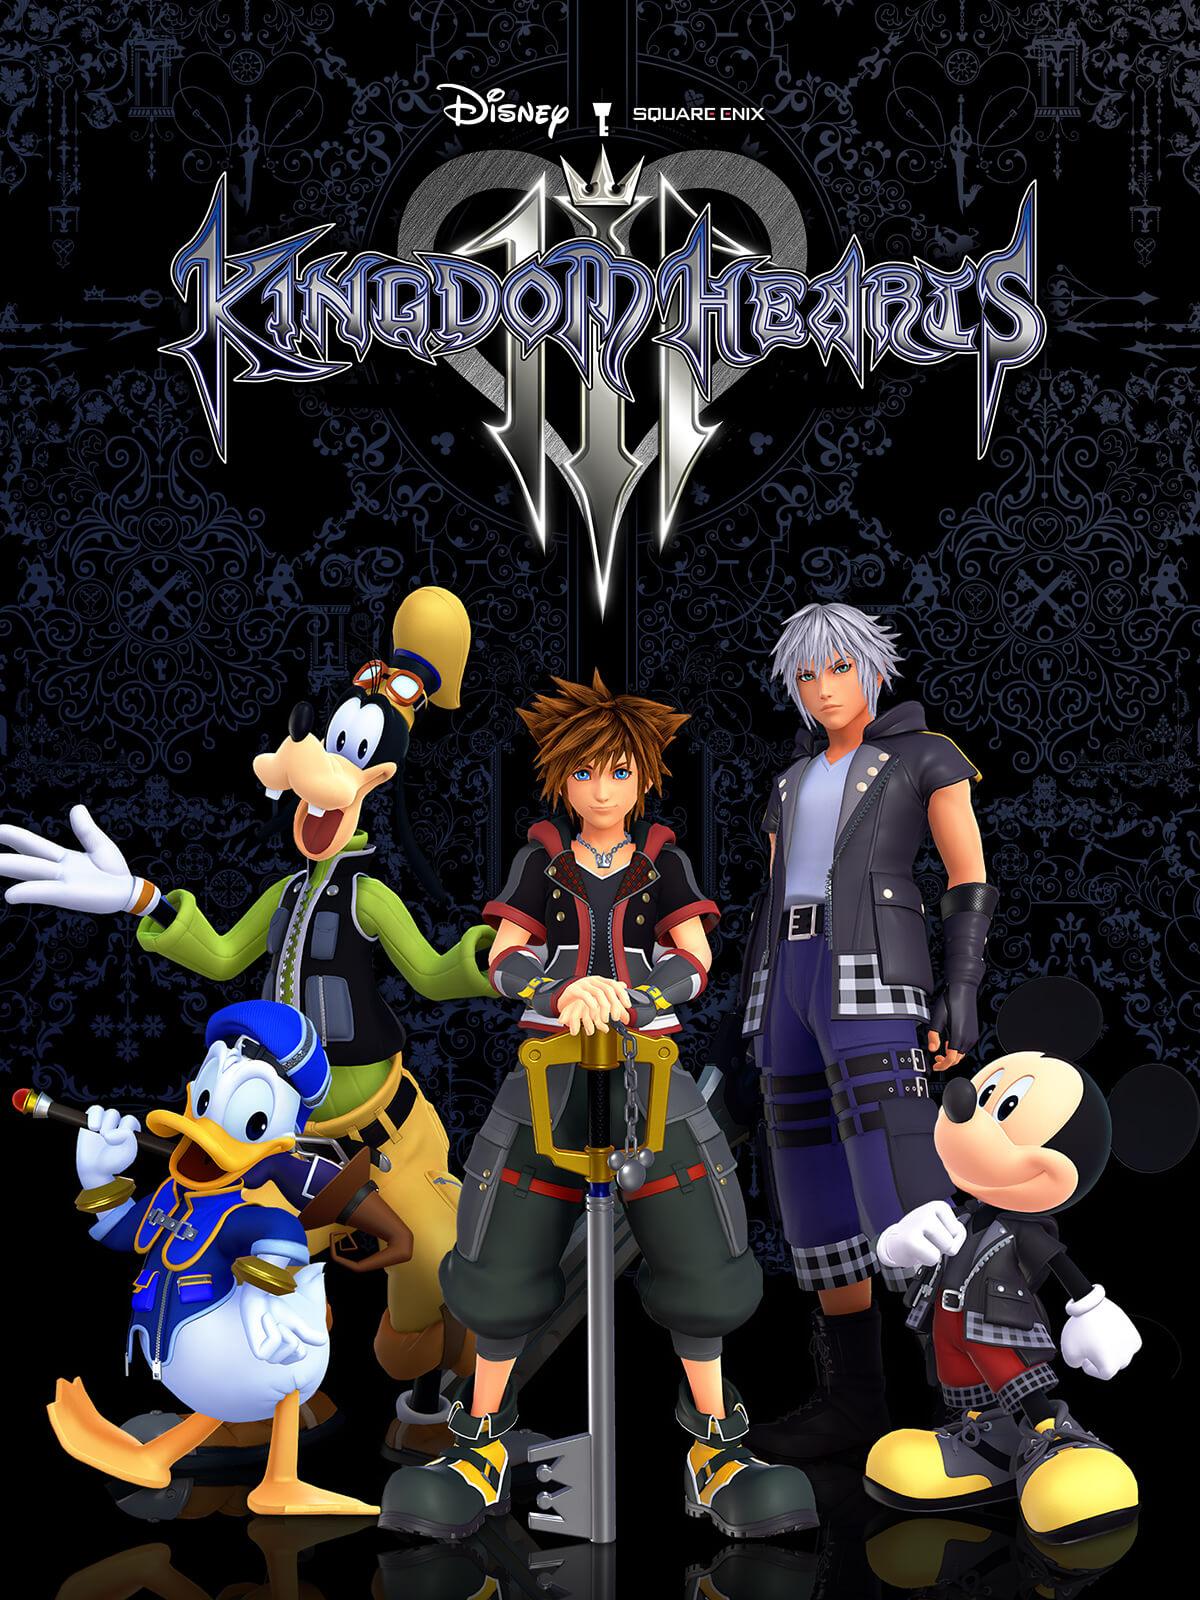 KINGDOM HEARTS III + DLC + 3 Monate Disney+ (Neue Abonnenten 18+) gratis